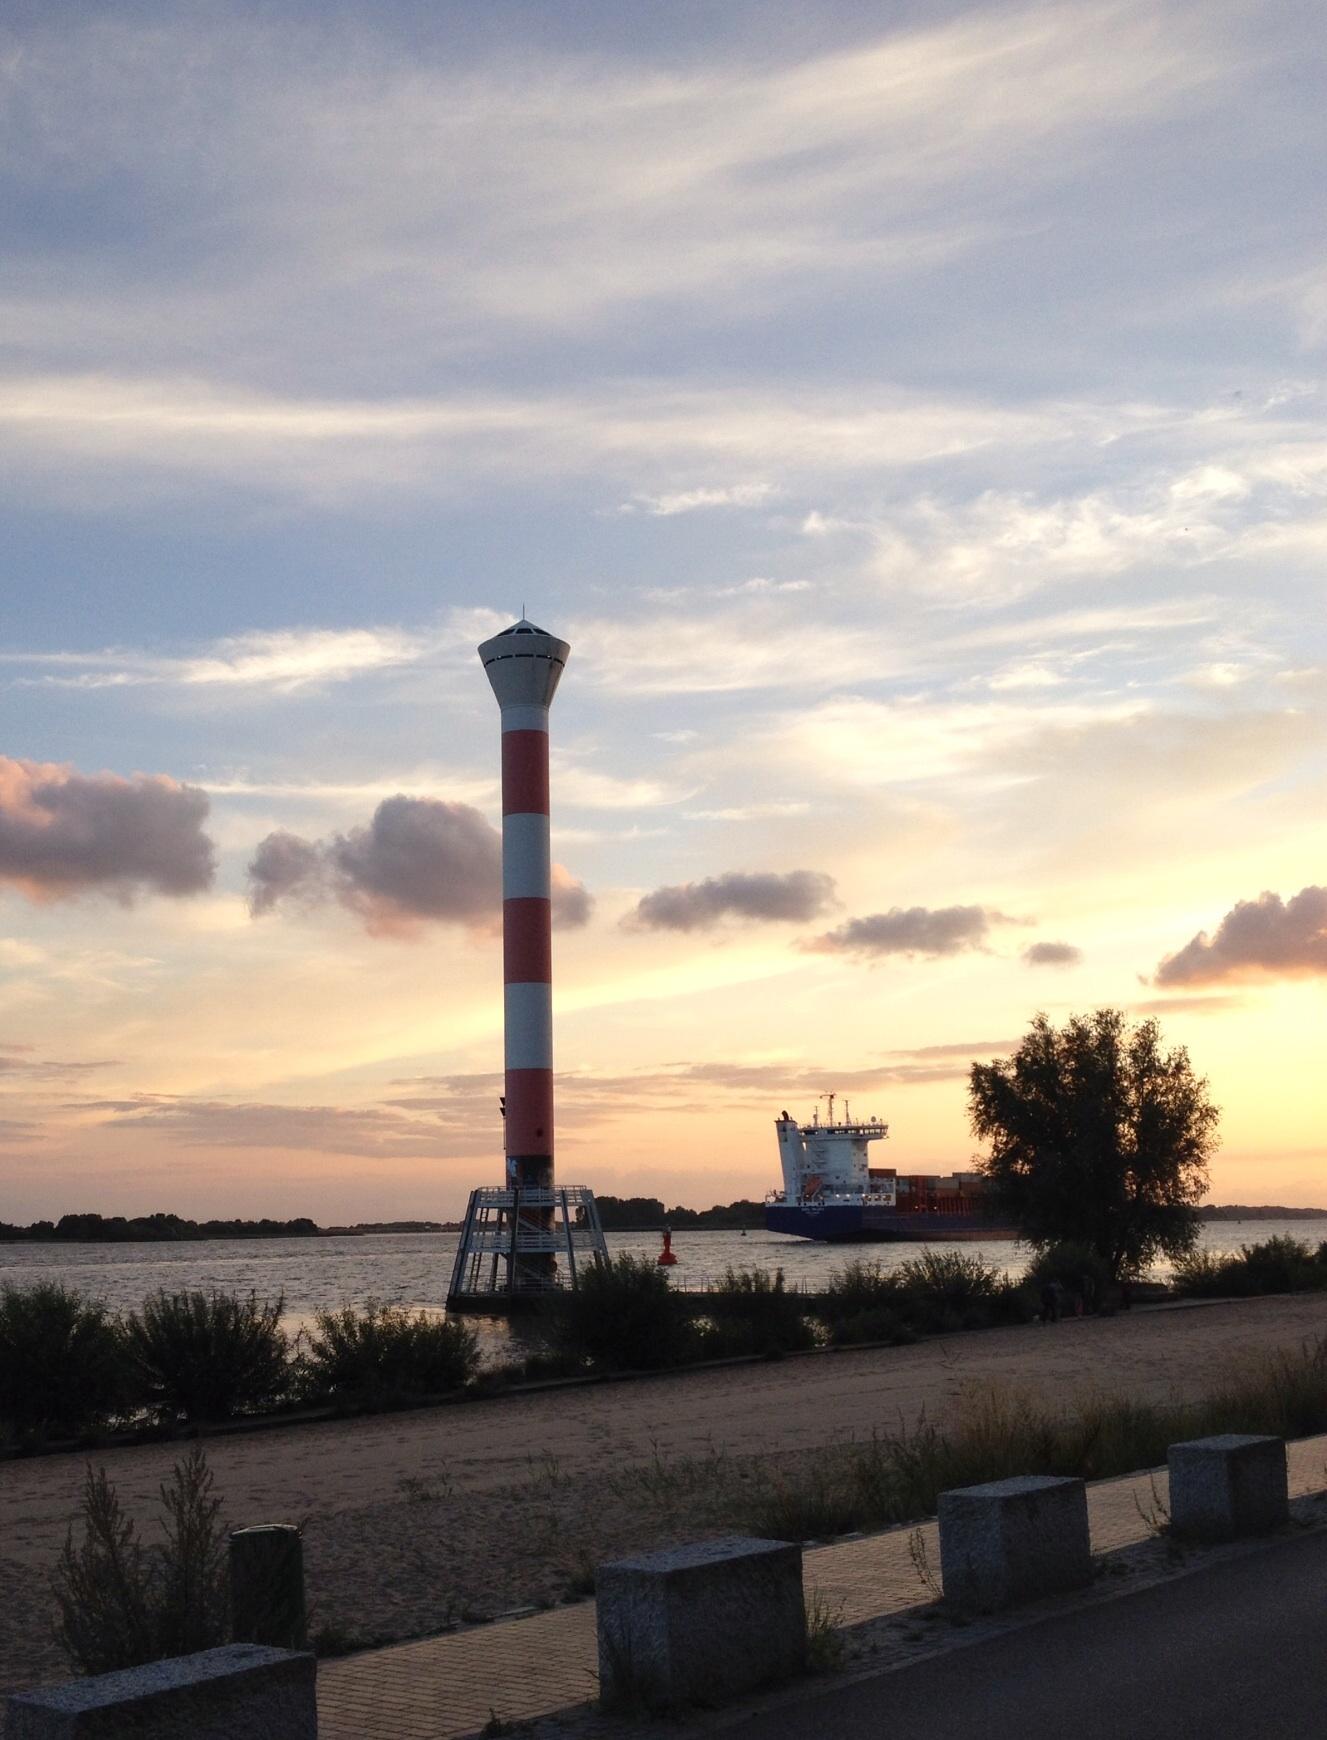 Sonnenuntergang Blankeneser Leuchtturm